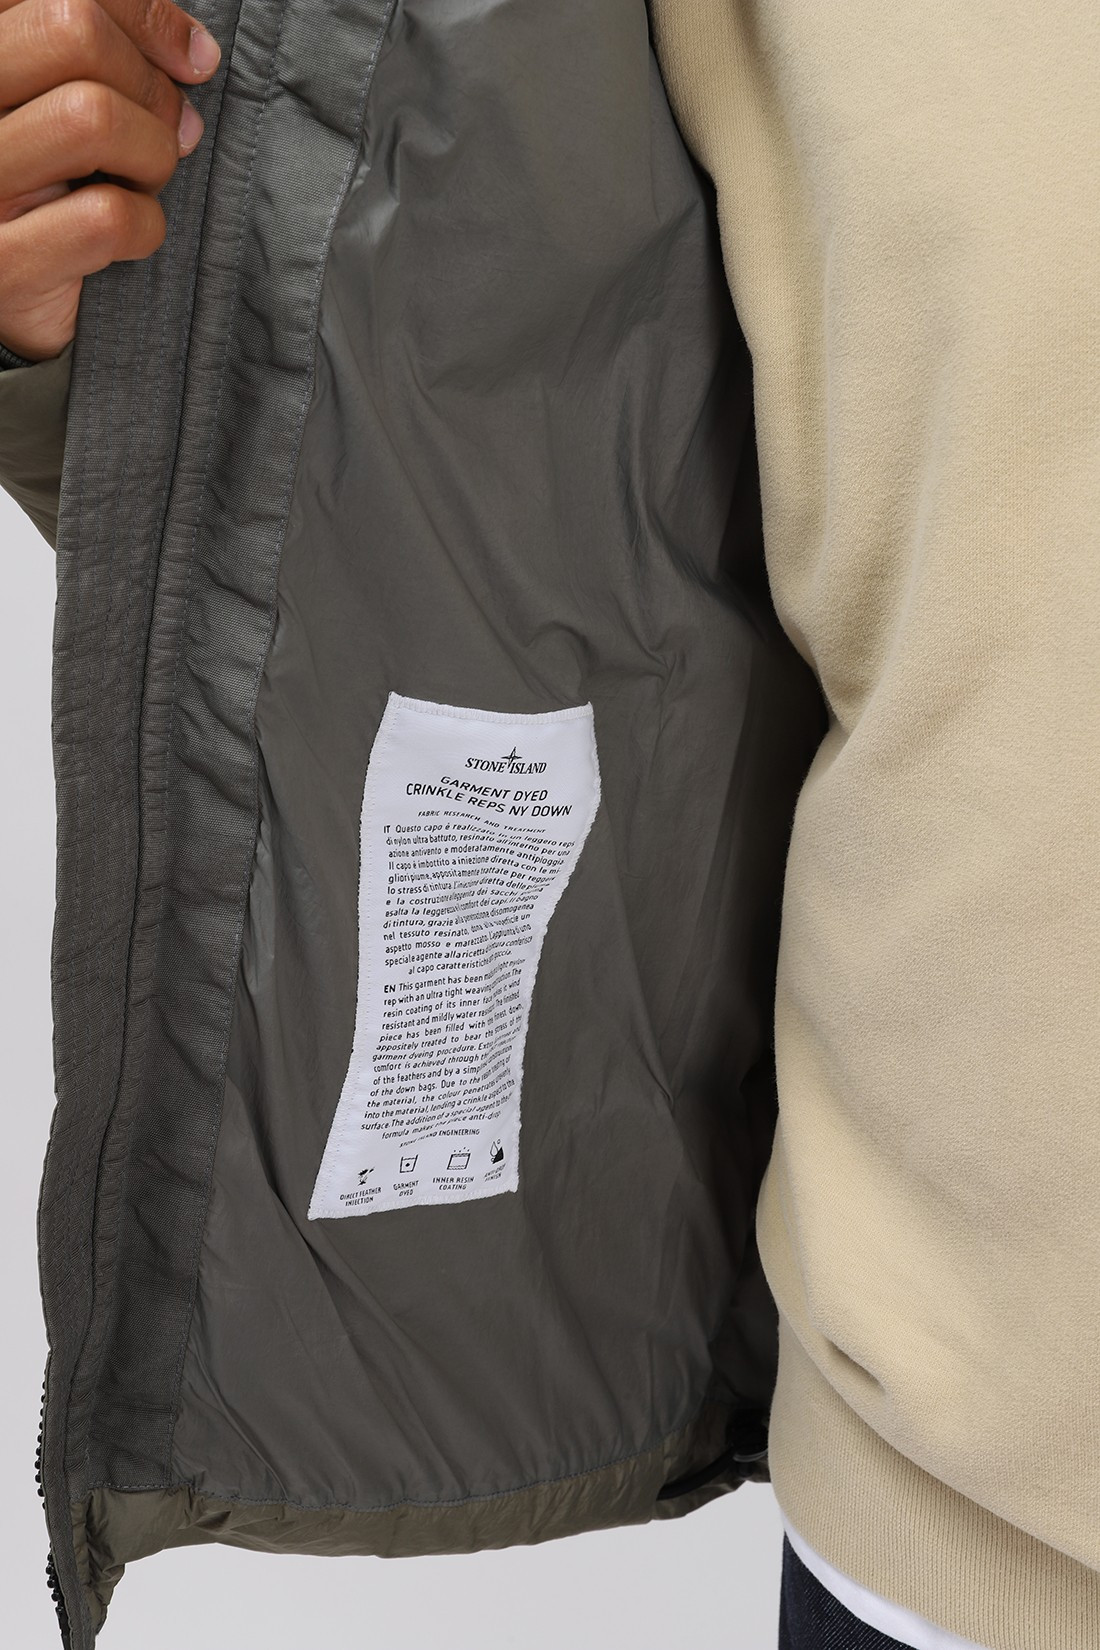 STONE ISLAND / 40123 real down jacket v0055 Salvia